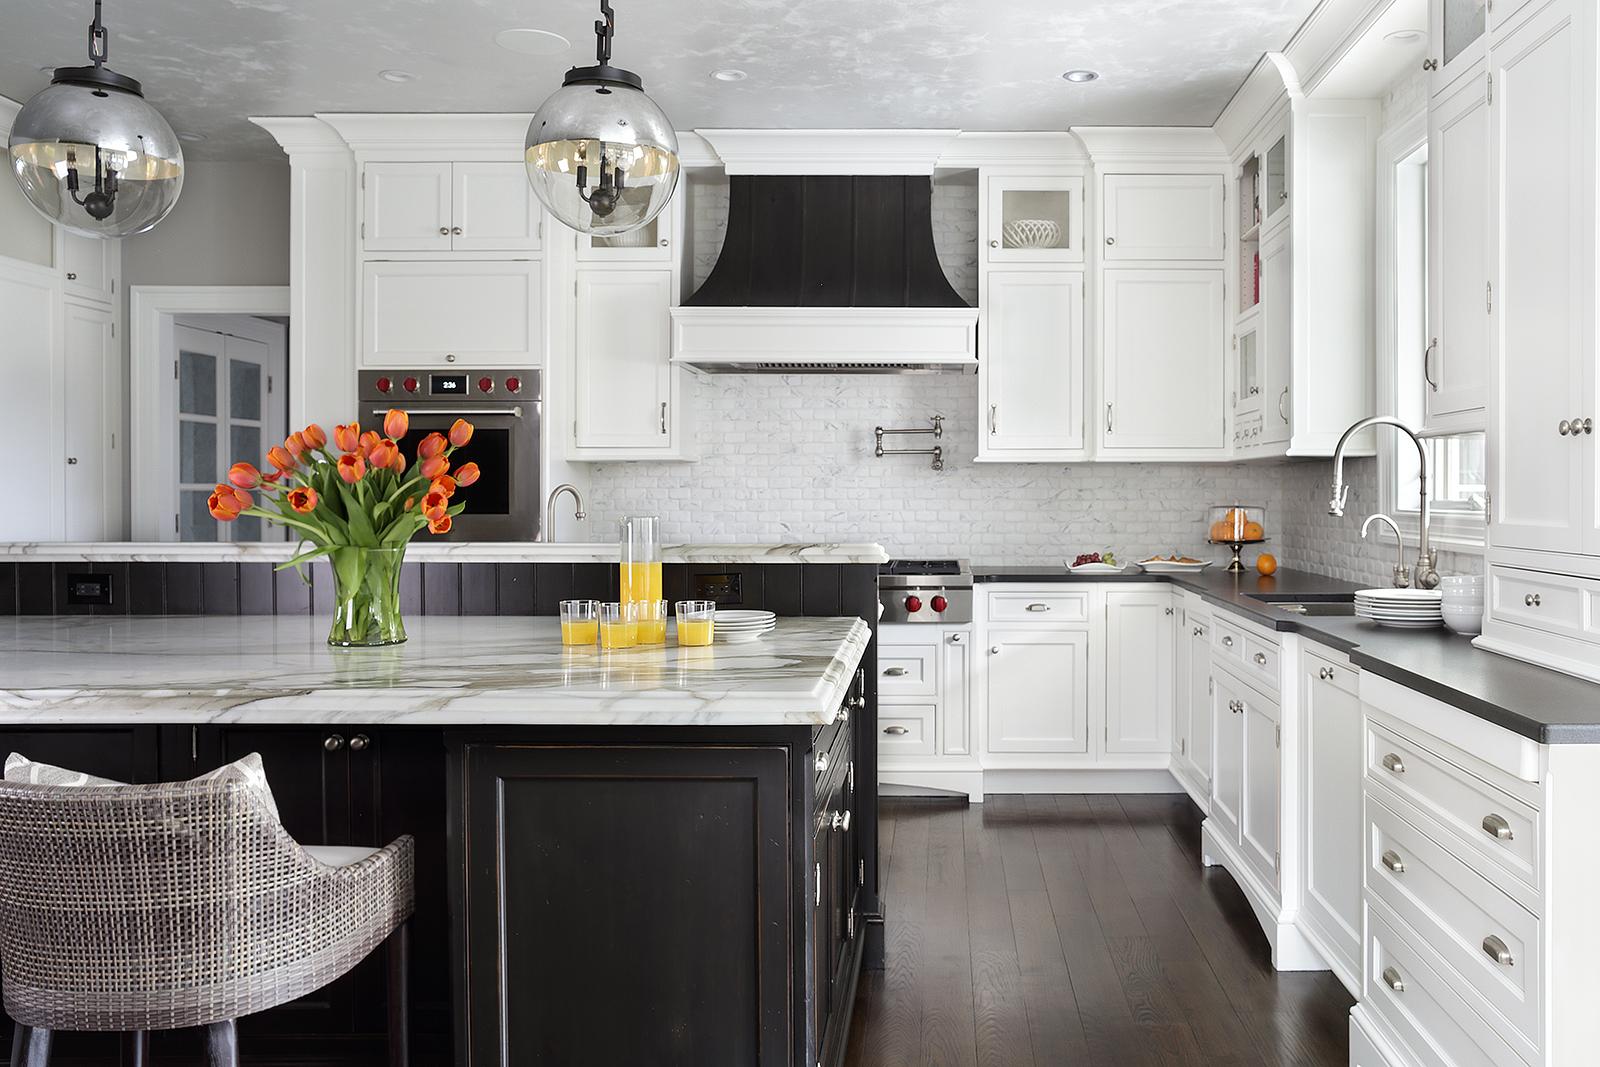 Designer kitchen with metallic venetian plaster ceiling by Valerie Grant Interiors